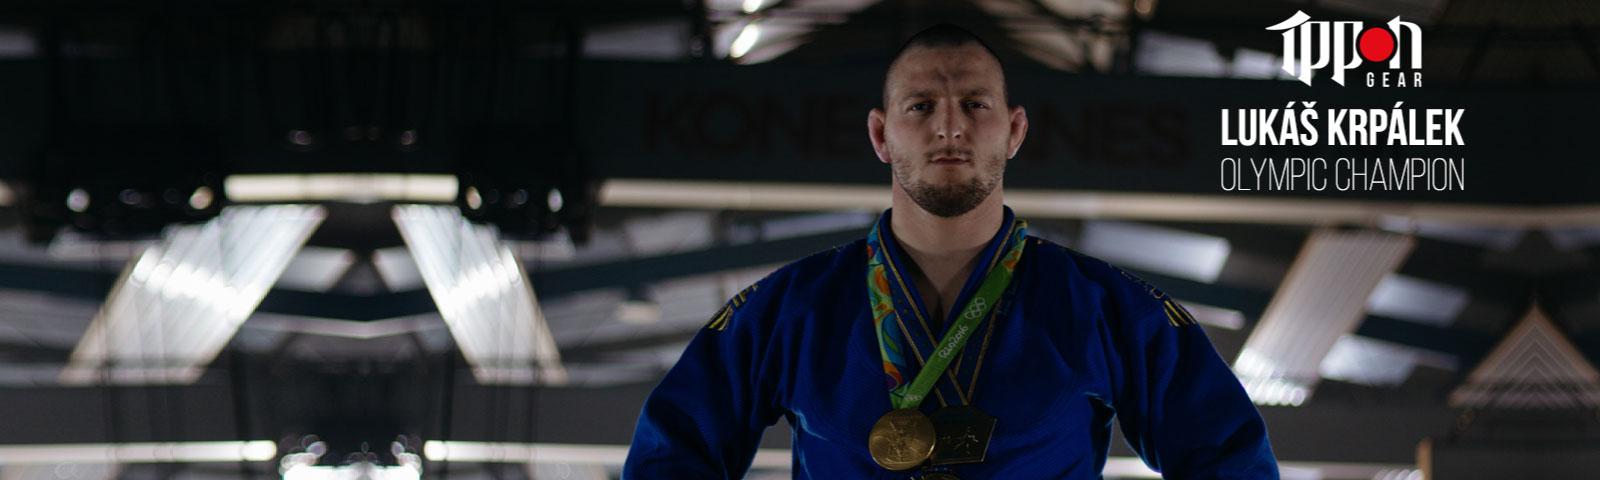 Budopunkt Ippon Gear Judo